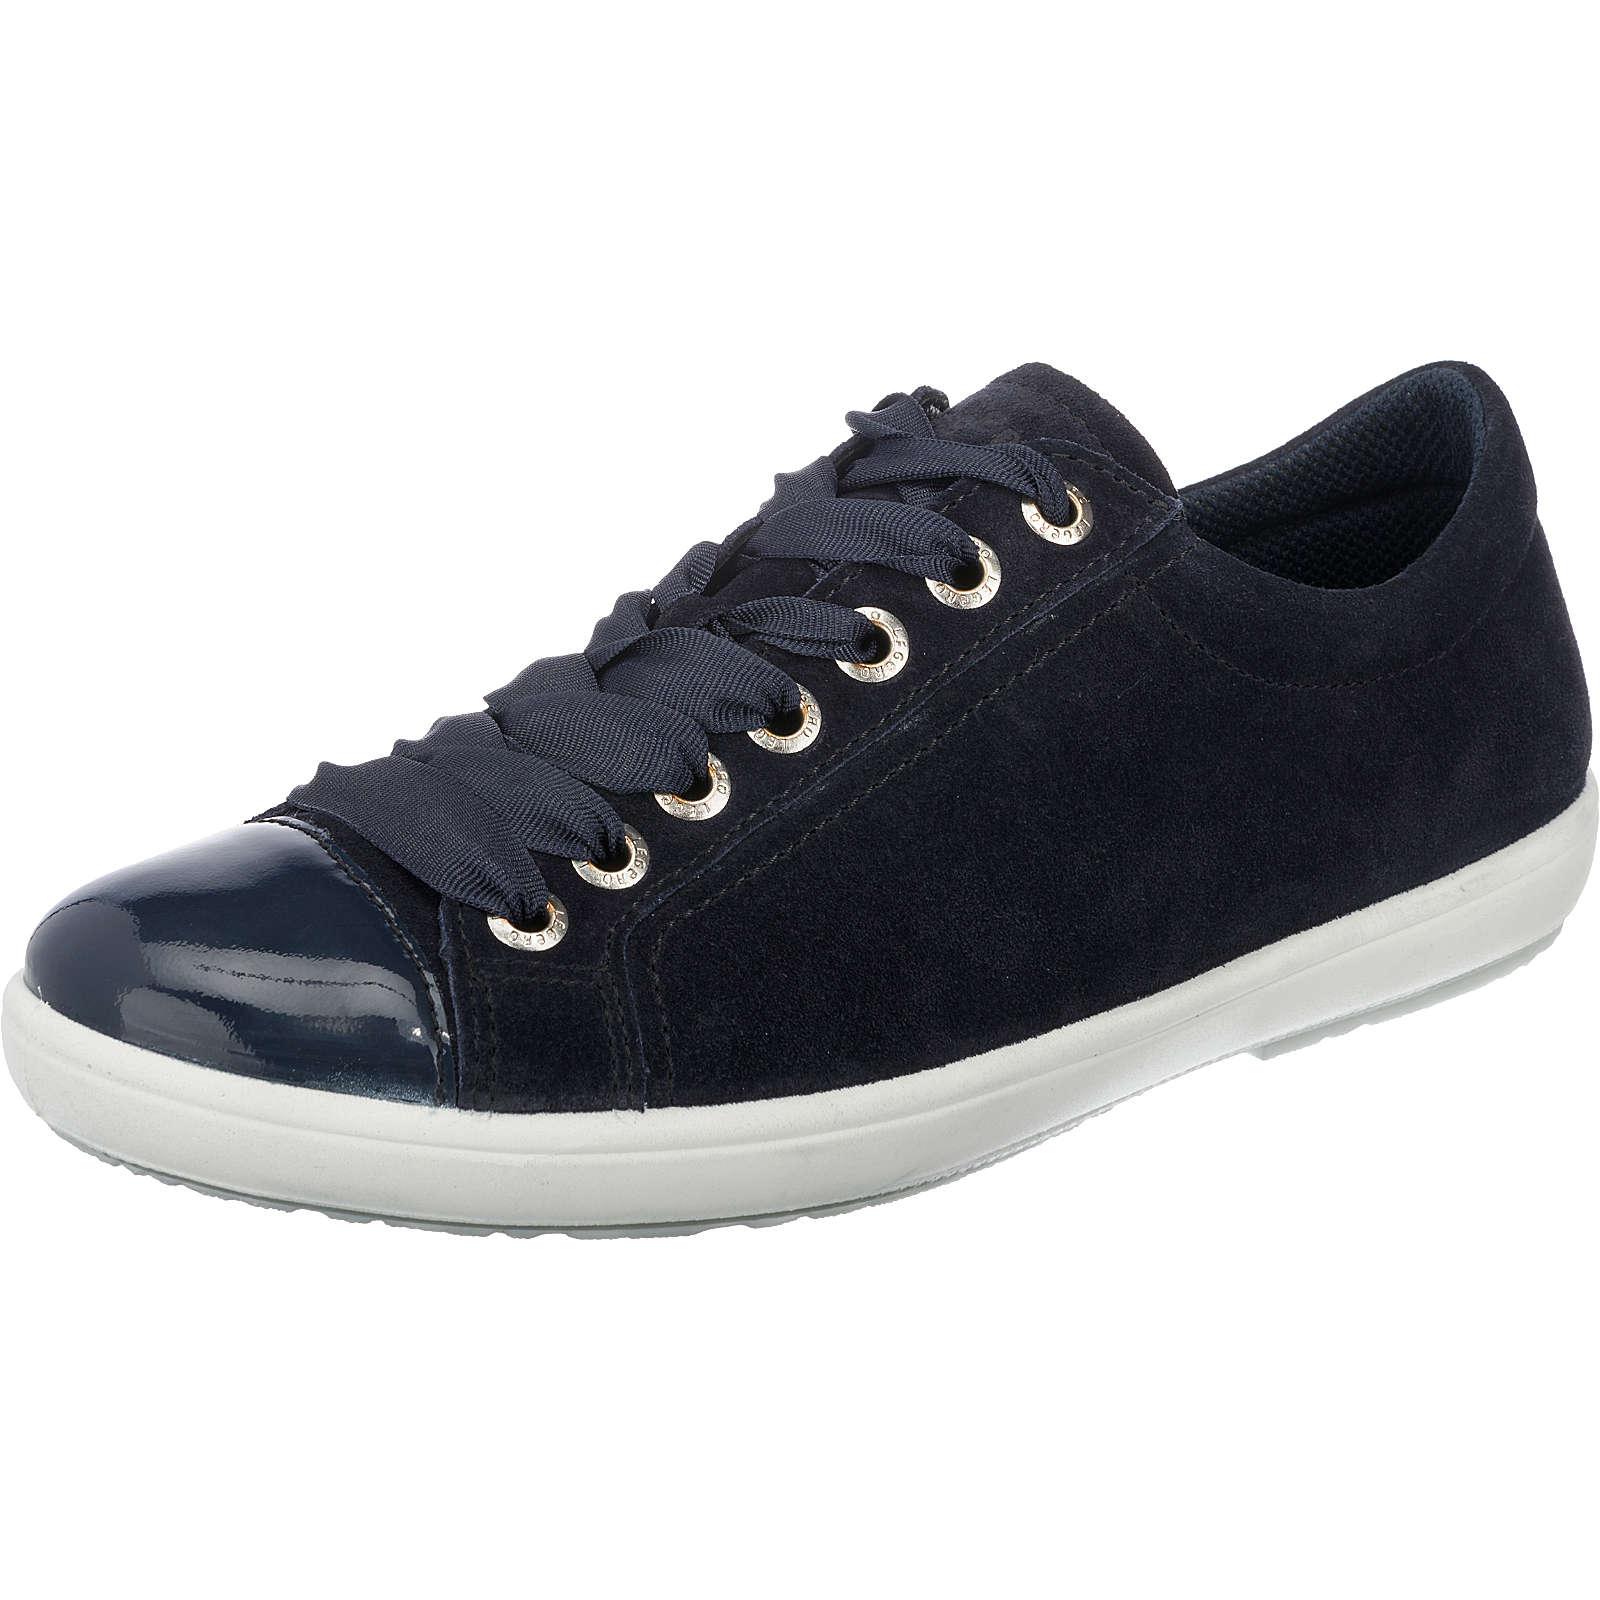 Legero TRAPANI Sneakers Low blau Damen Gr. 36